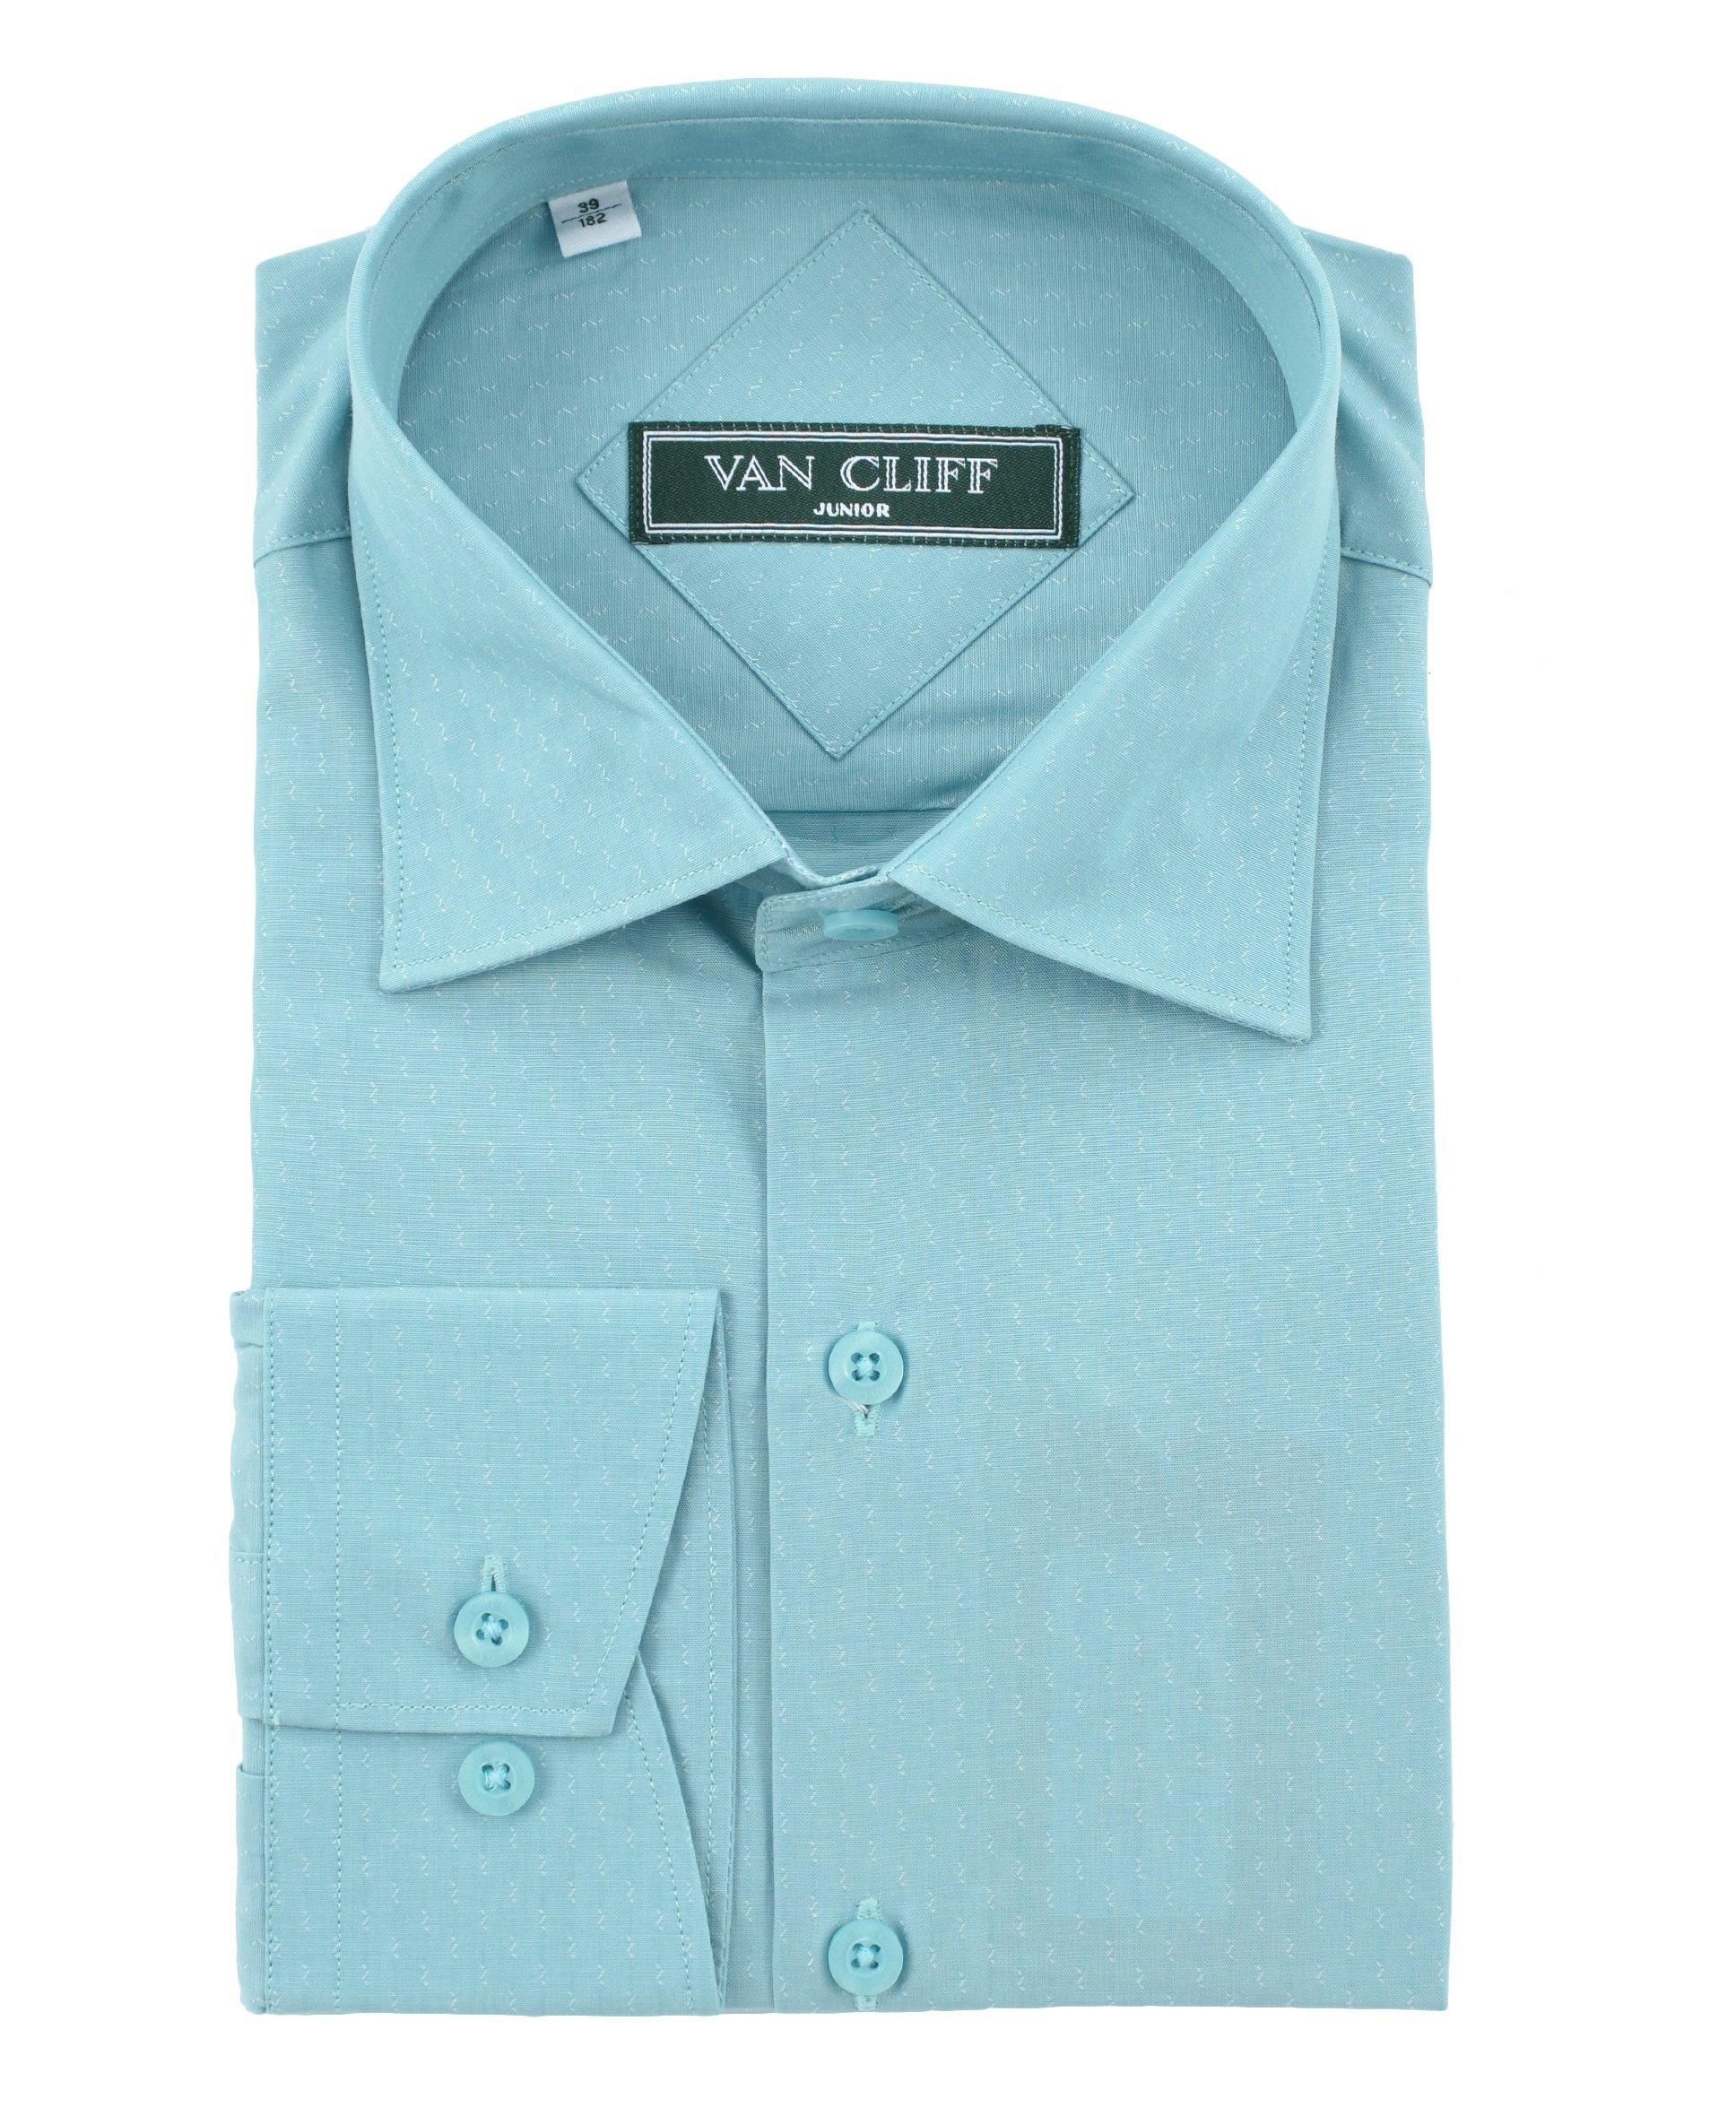 Рубашка для мальчика YSVC17057бир